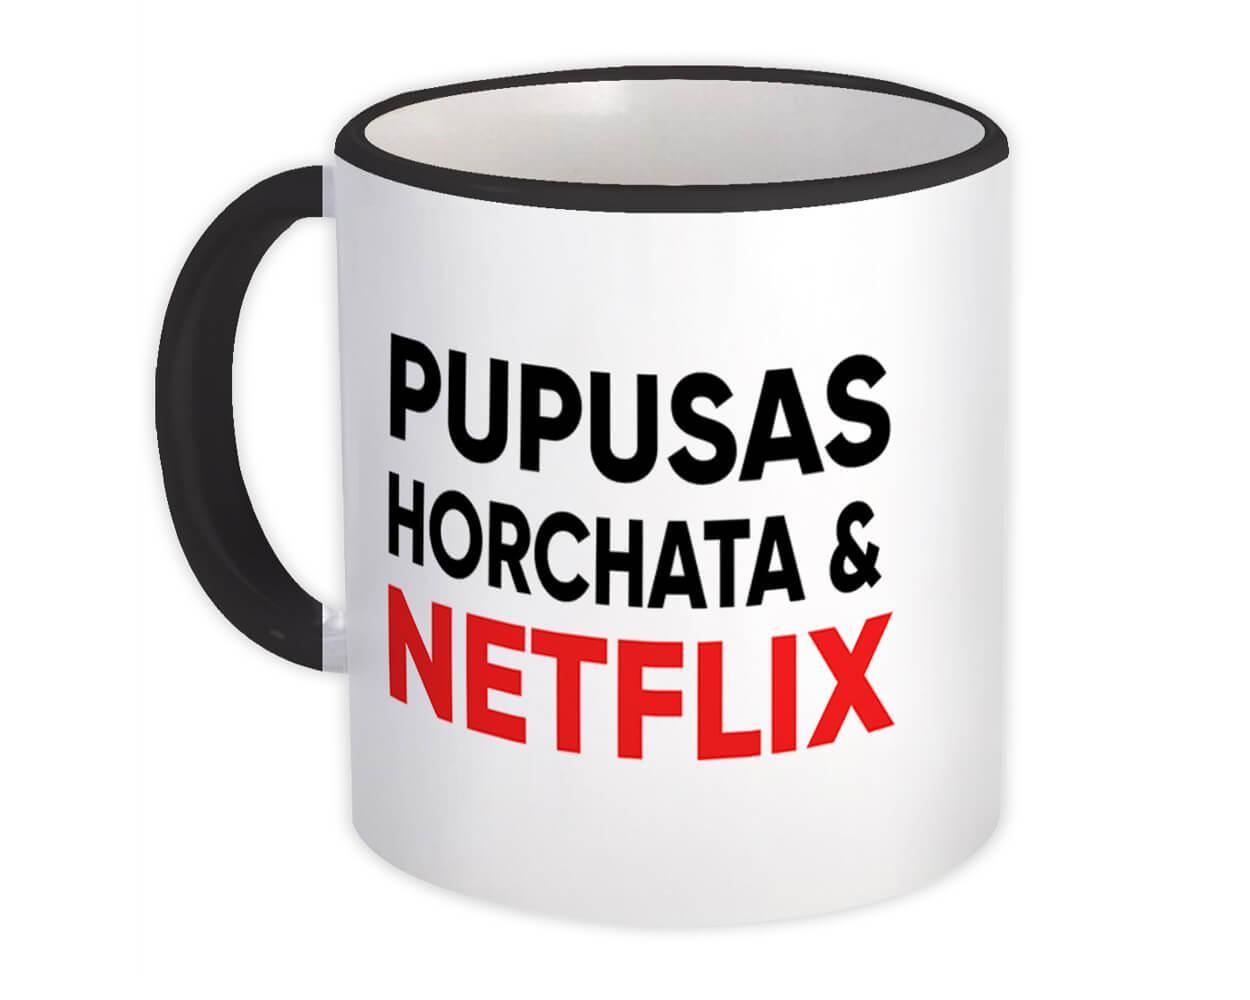 Pupusas Horchata Netflix : Gift Mug Honduras El Salvador Honduran Salvadorian